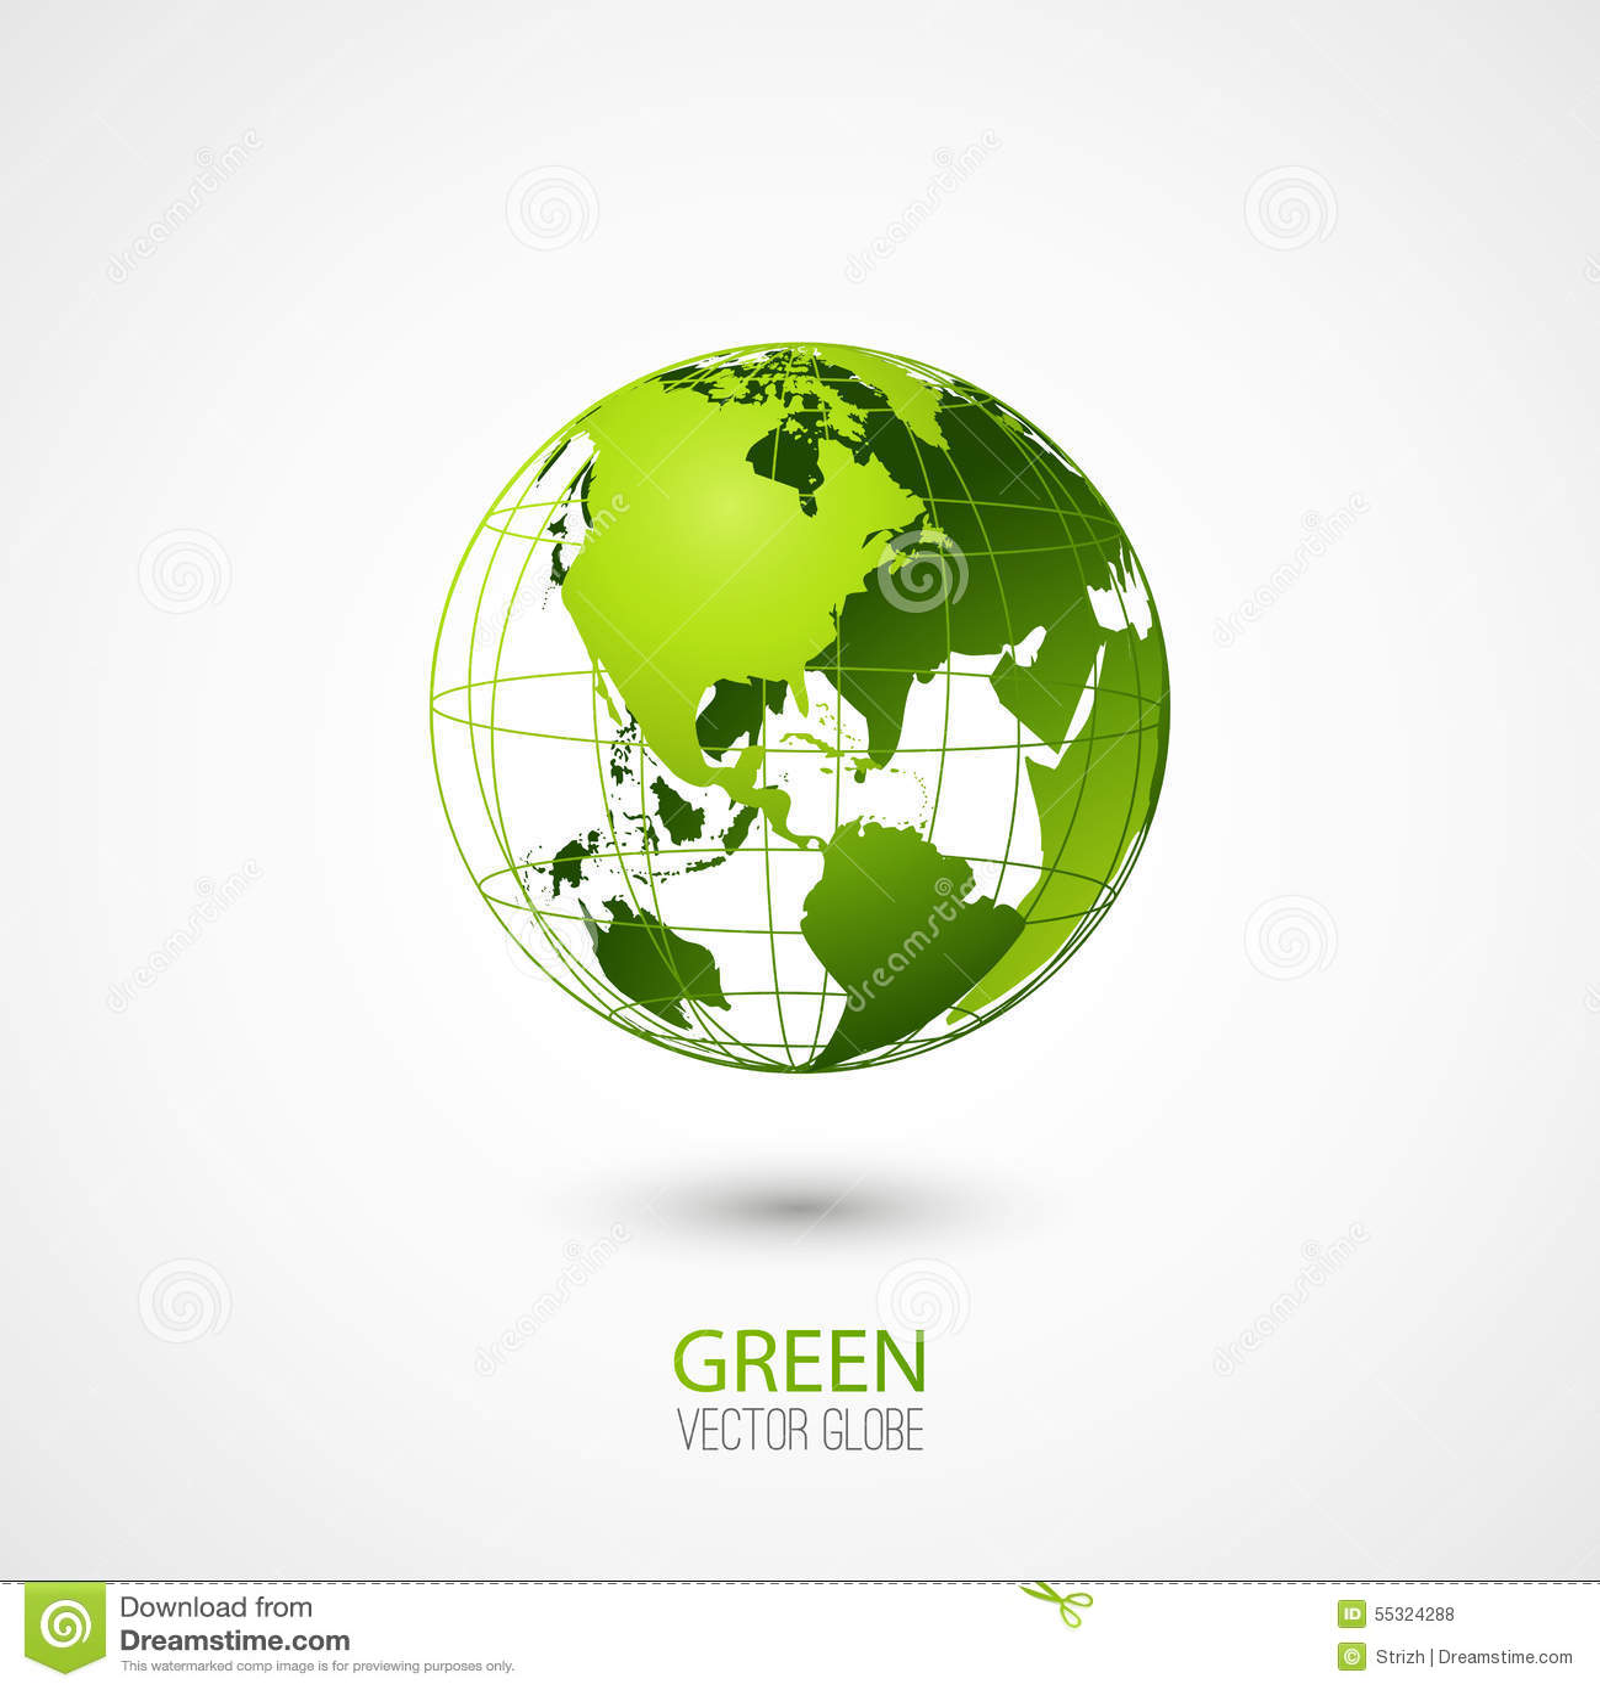 Green Globe Stock Illustration - Image: 55324288